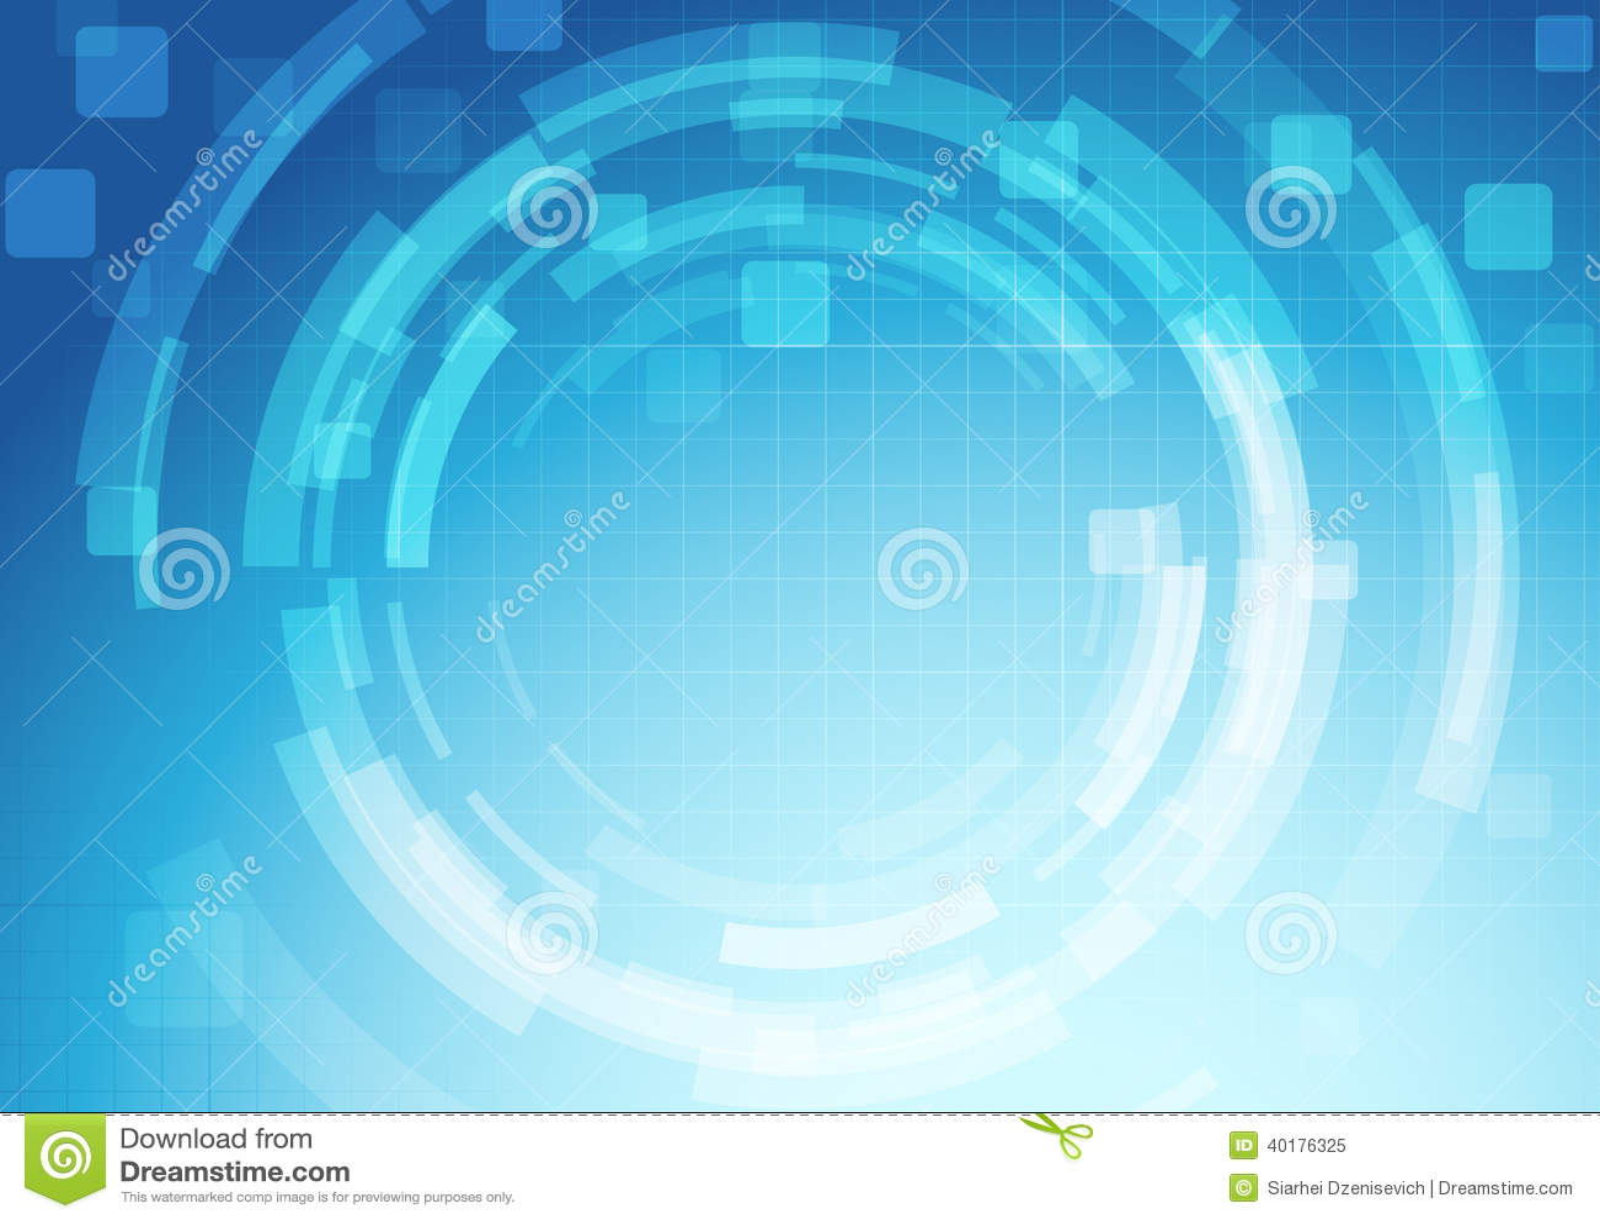 High Tech Web Design Templates